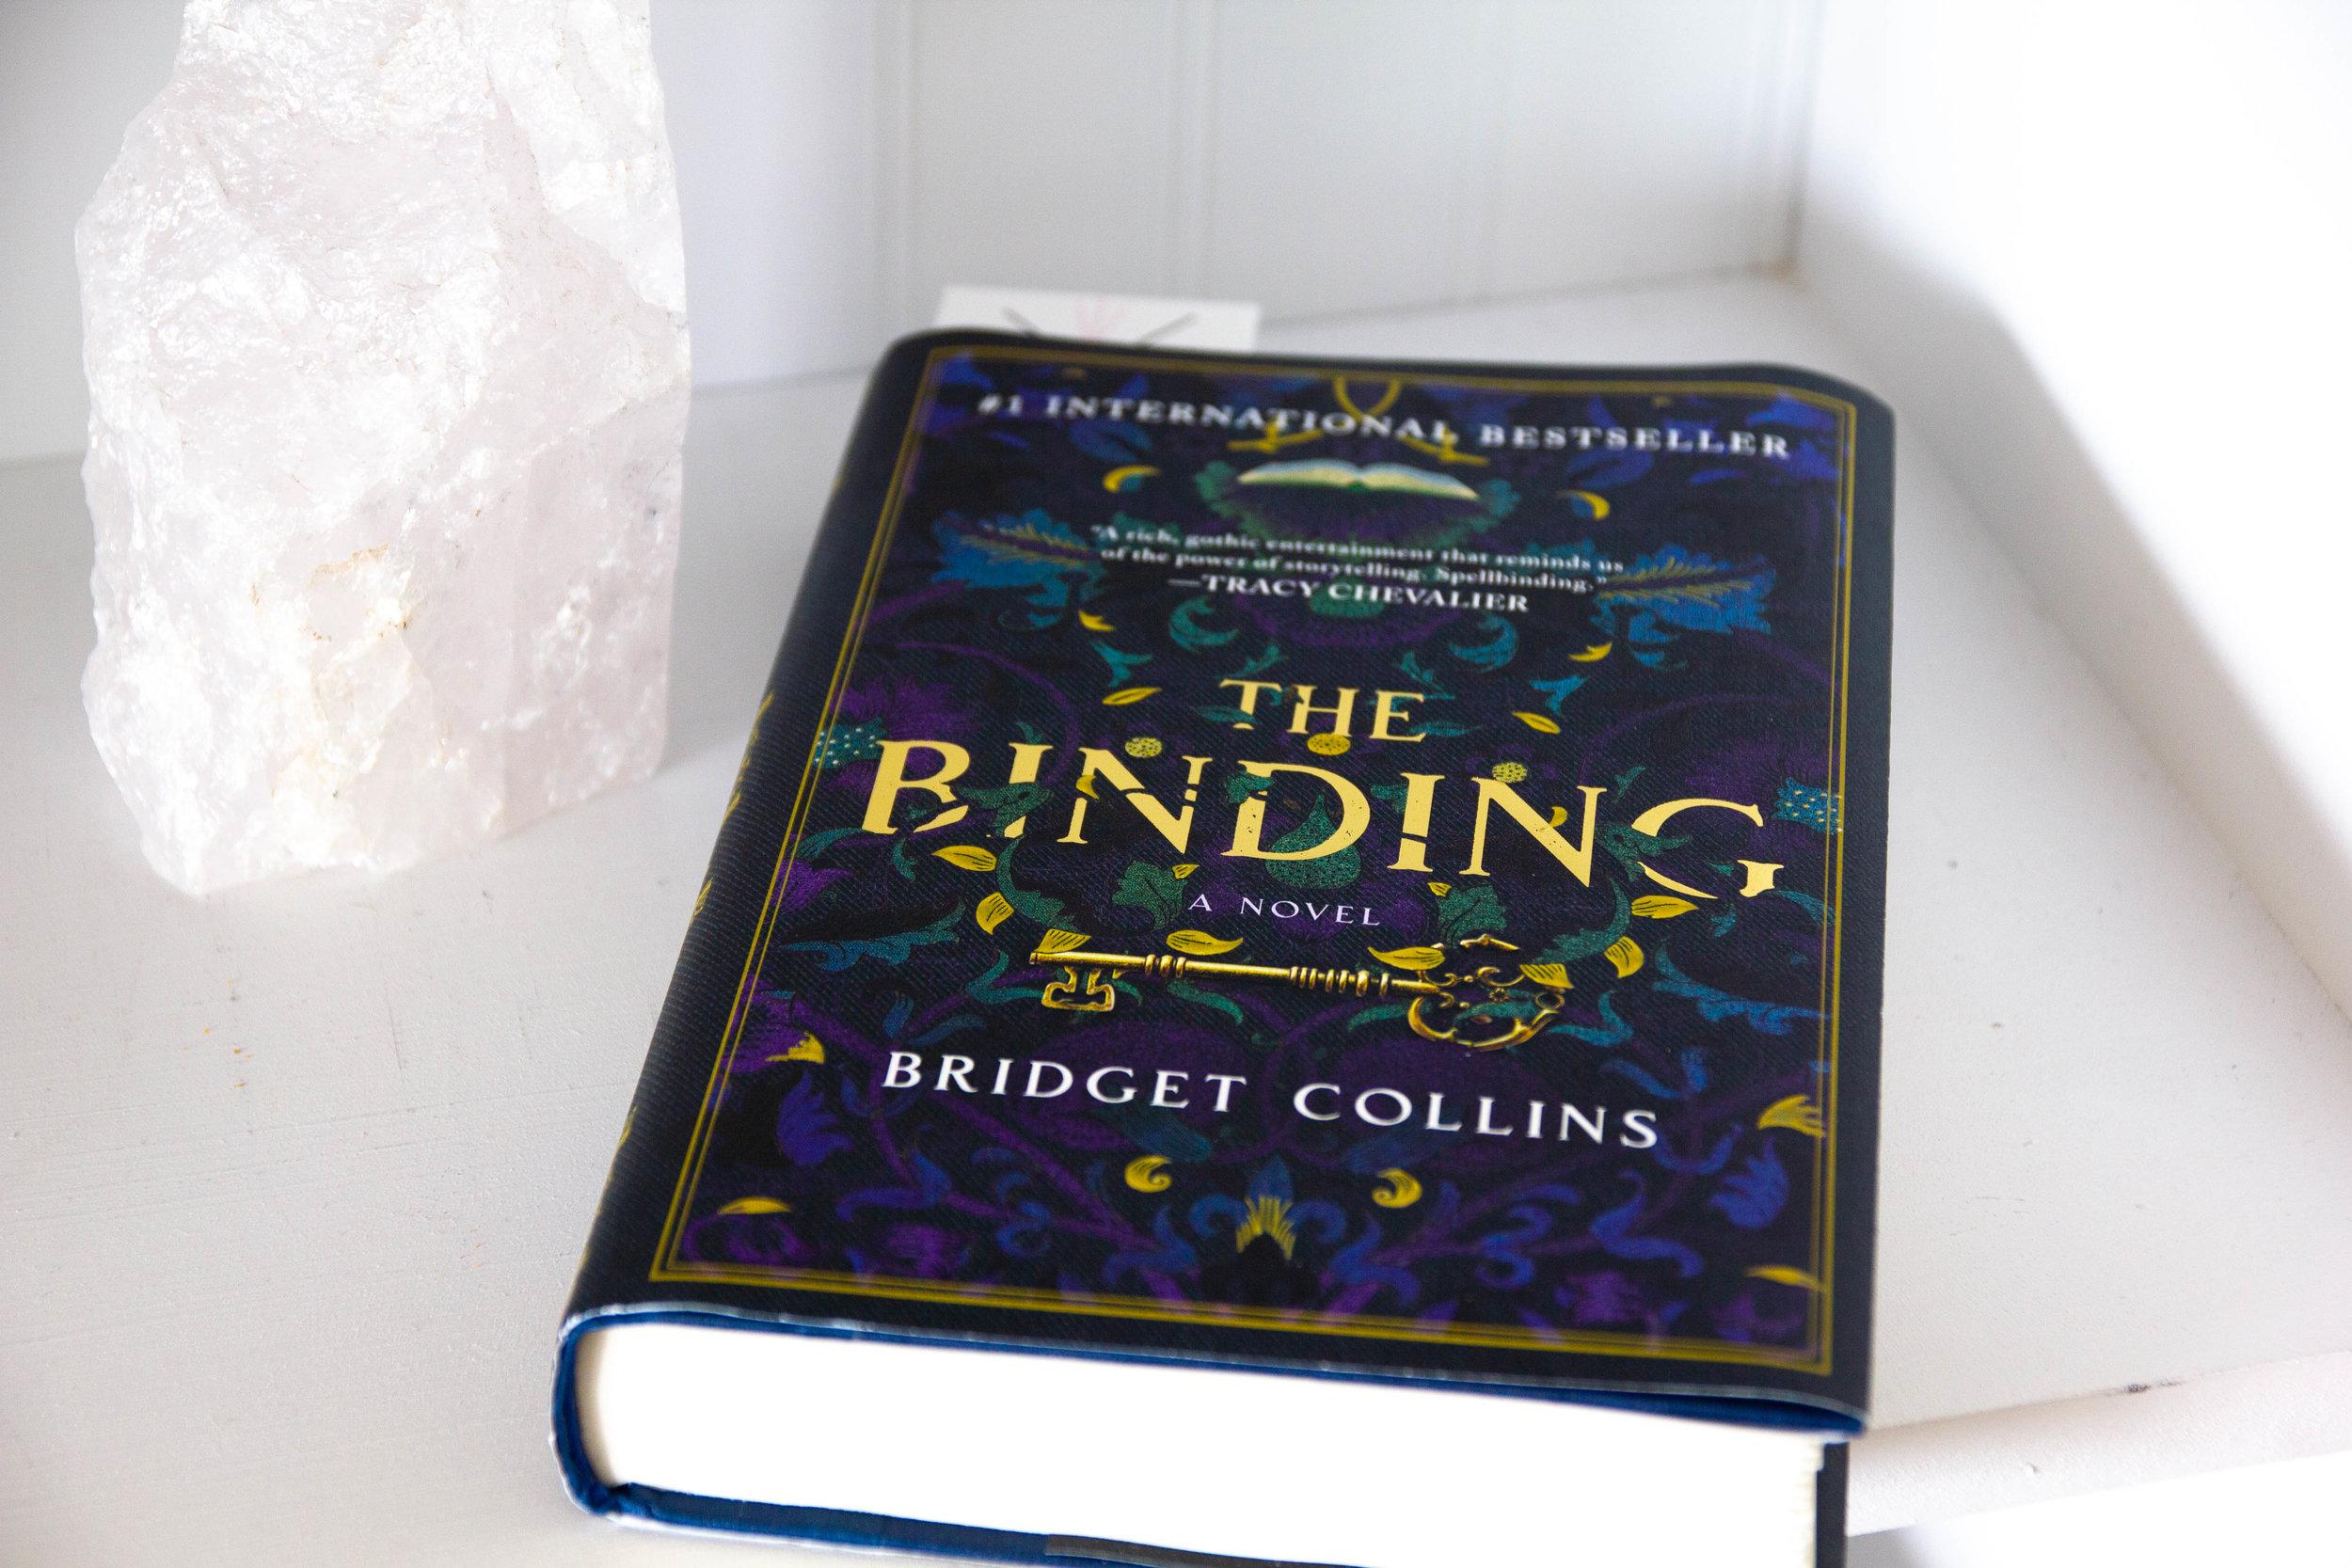 The Binding by Bridget Collins-3.jpg